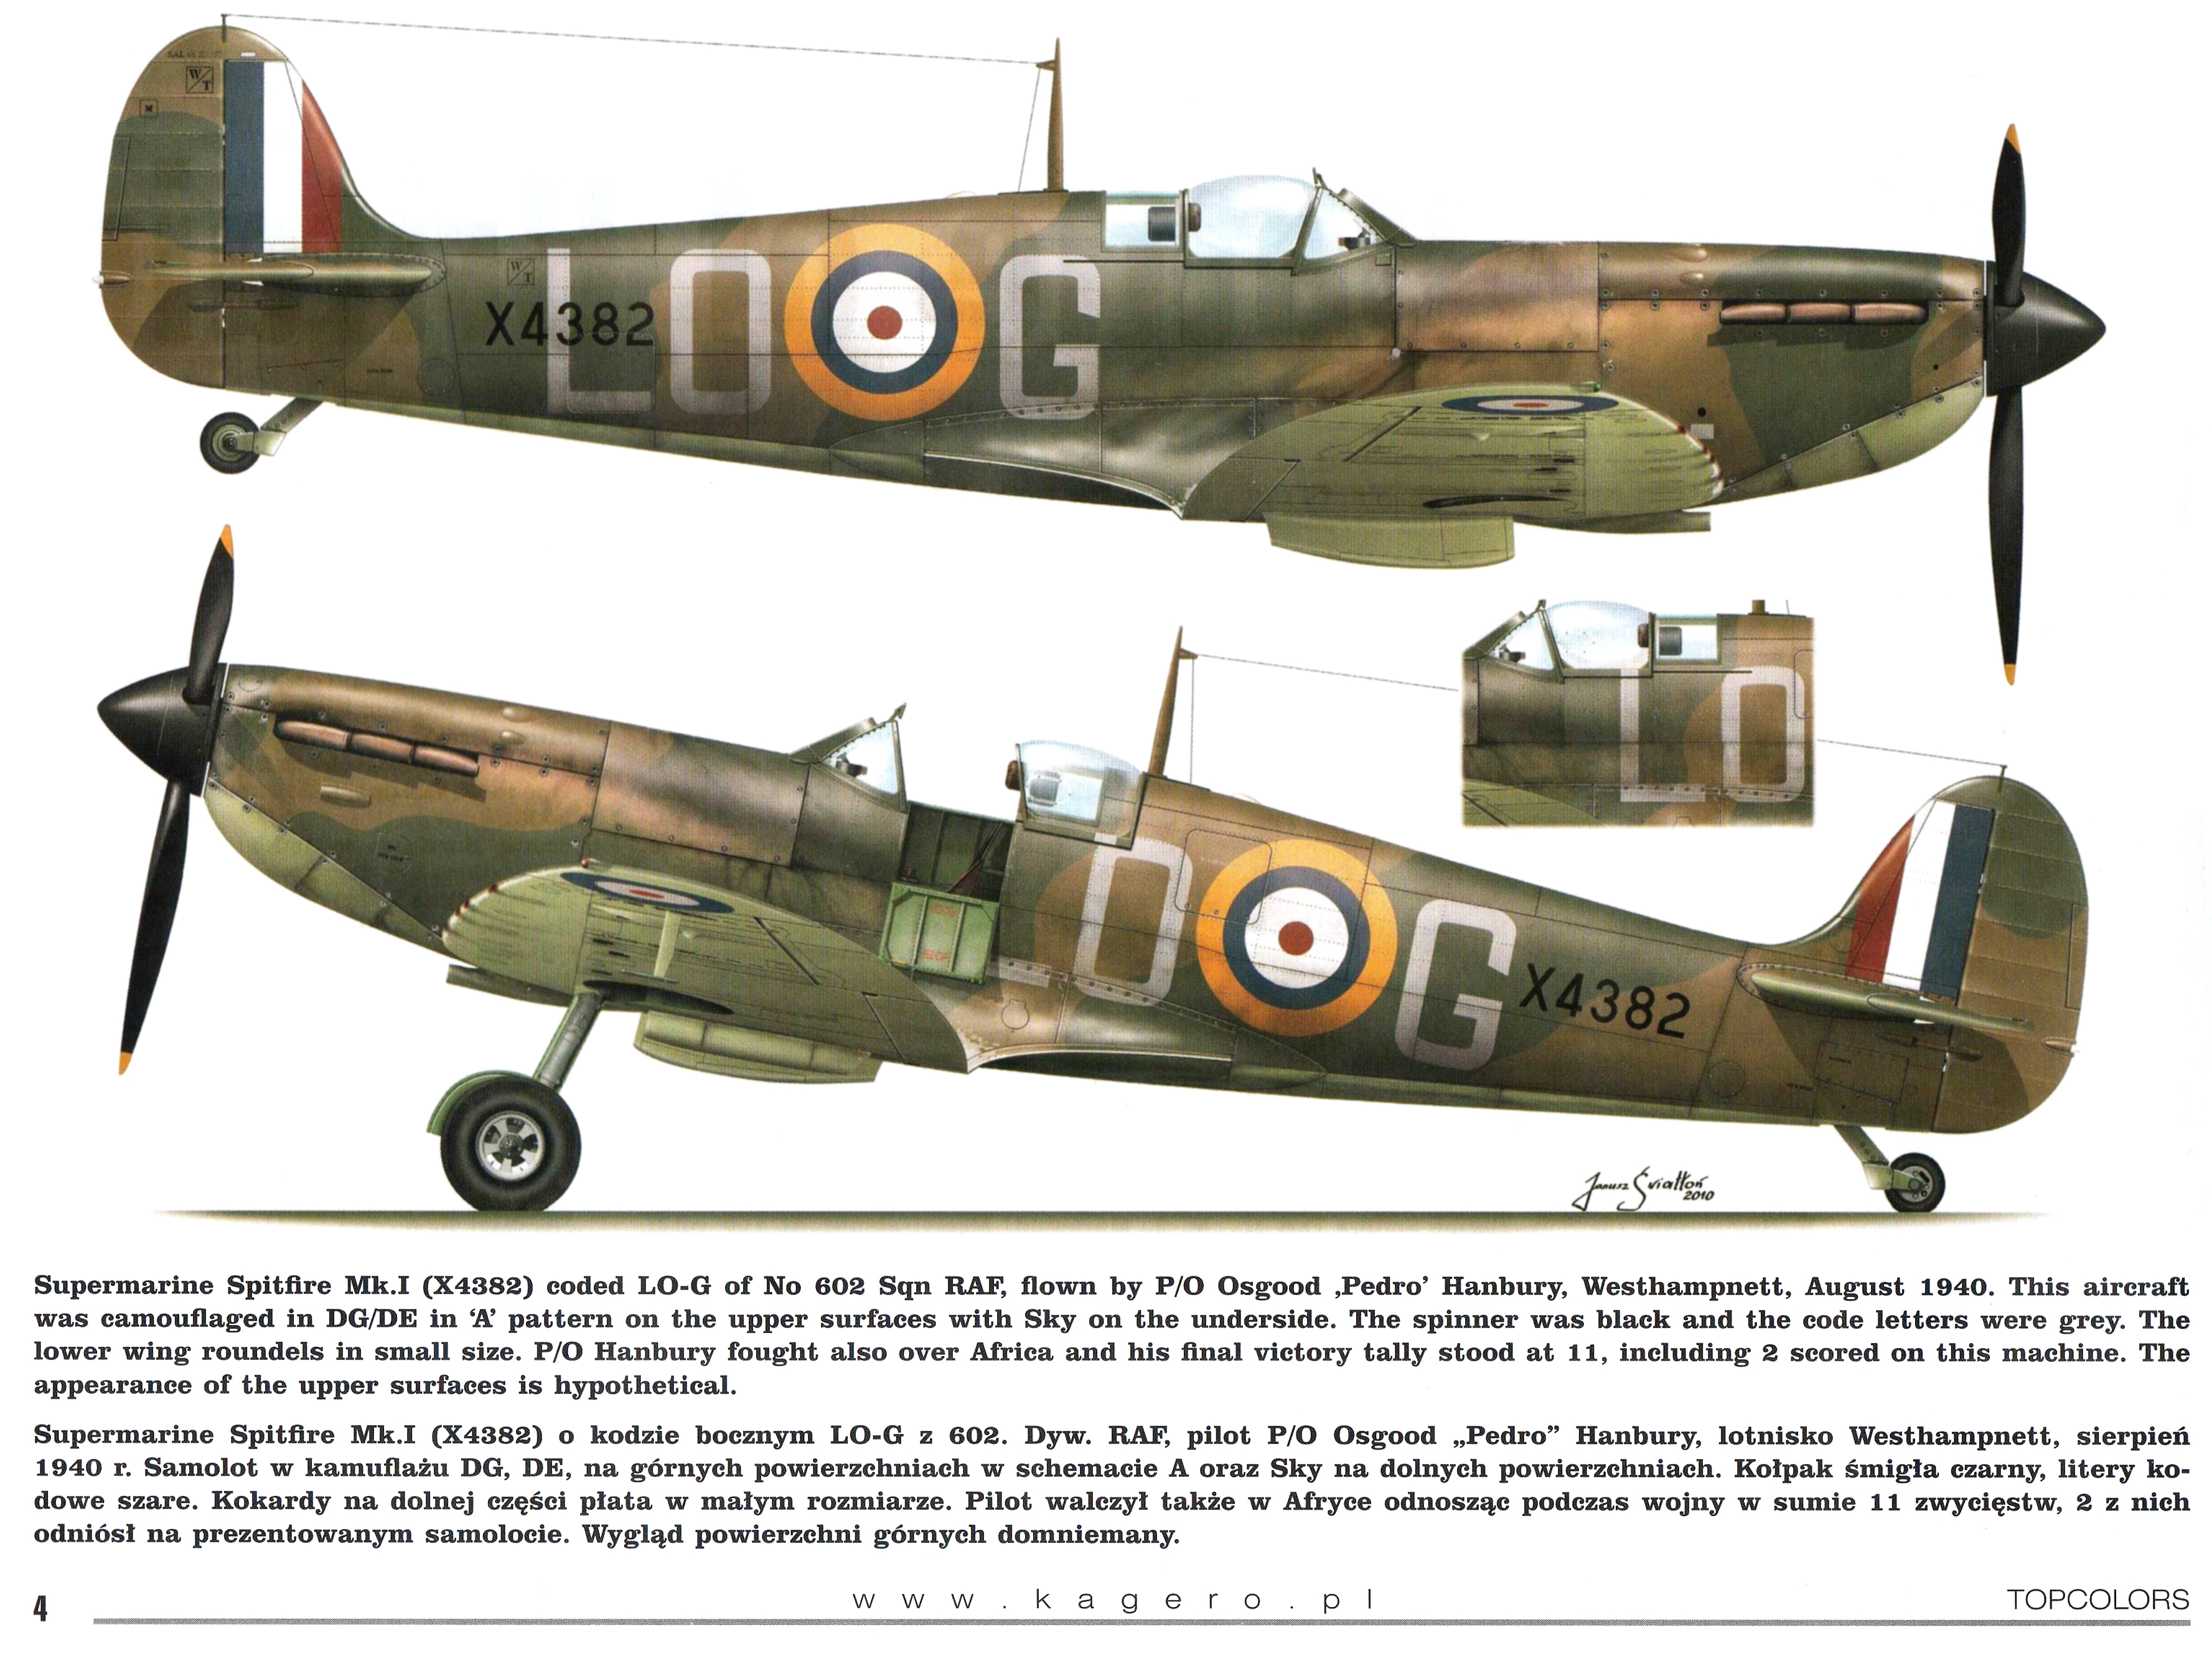 Spitfire MkIa RAF 602Sqn LOG Osgood Hanbury X4382 Westhampnett Aug 1940 TC15016 01